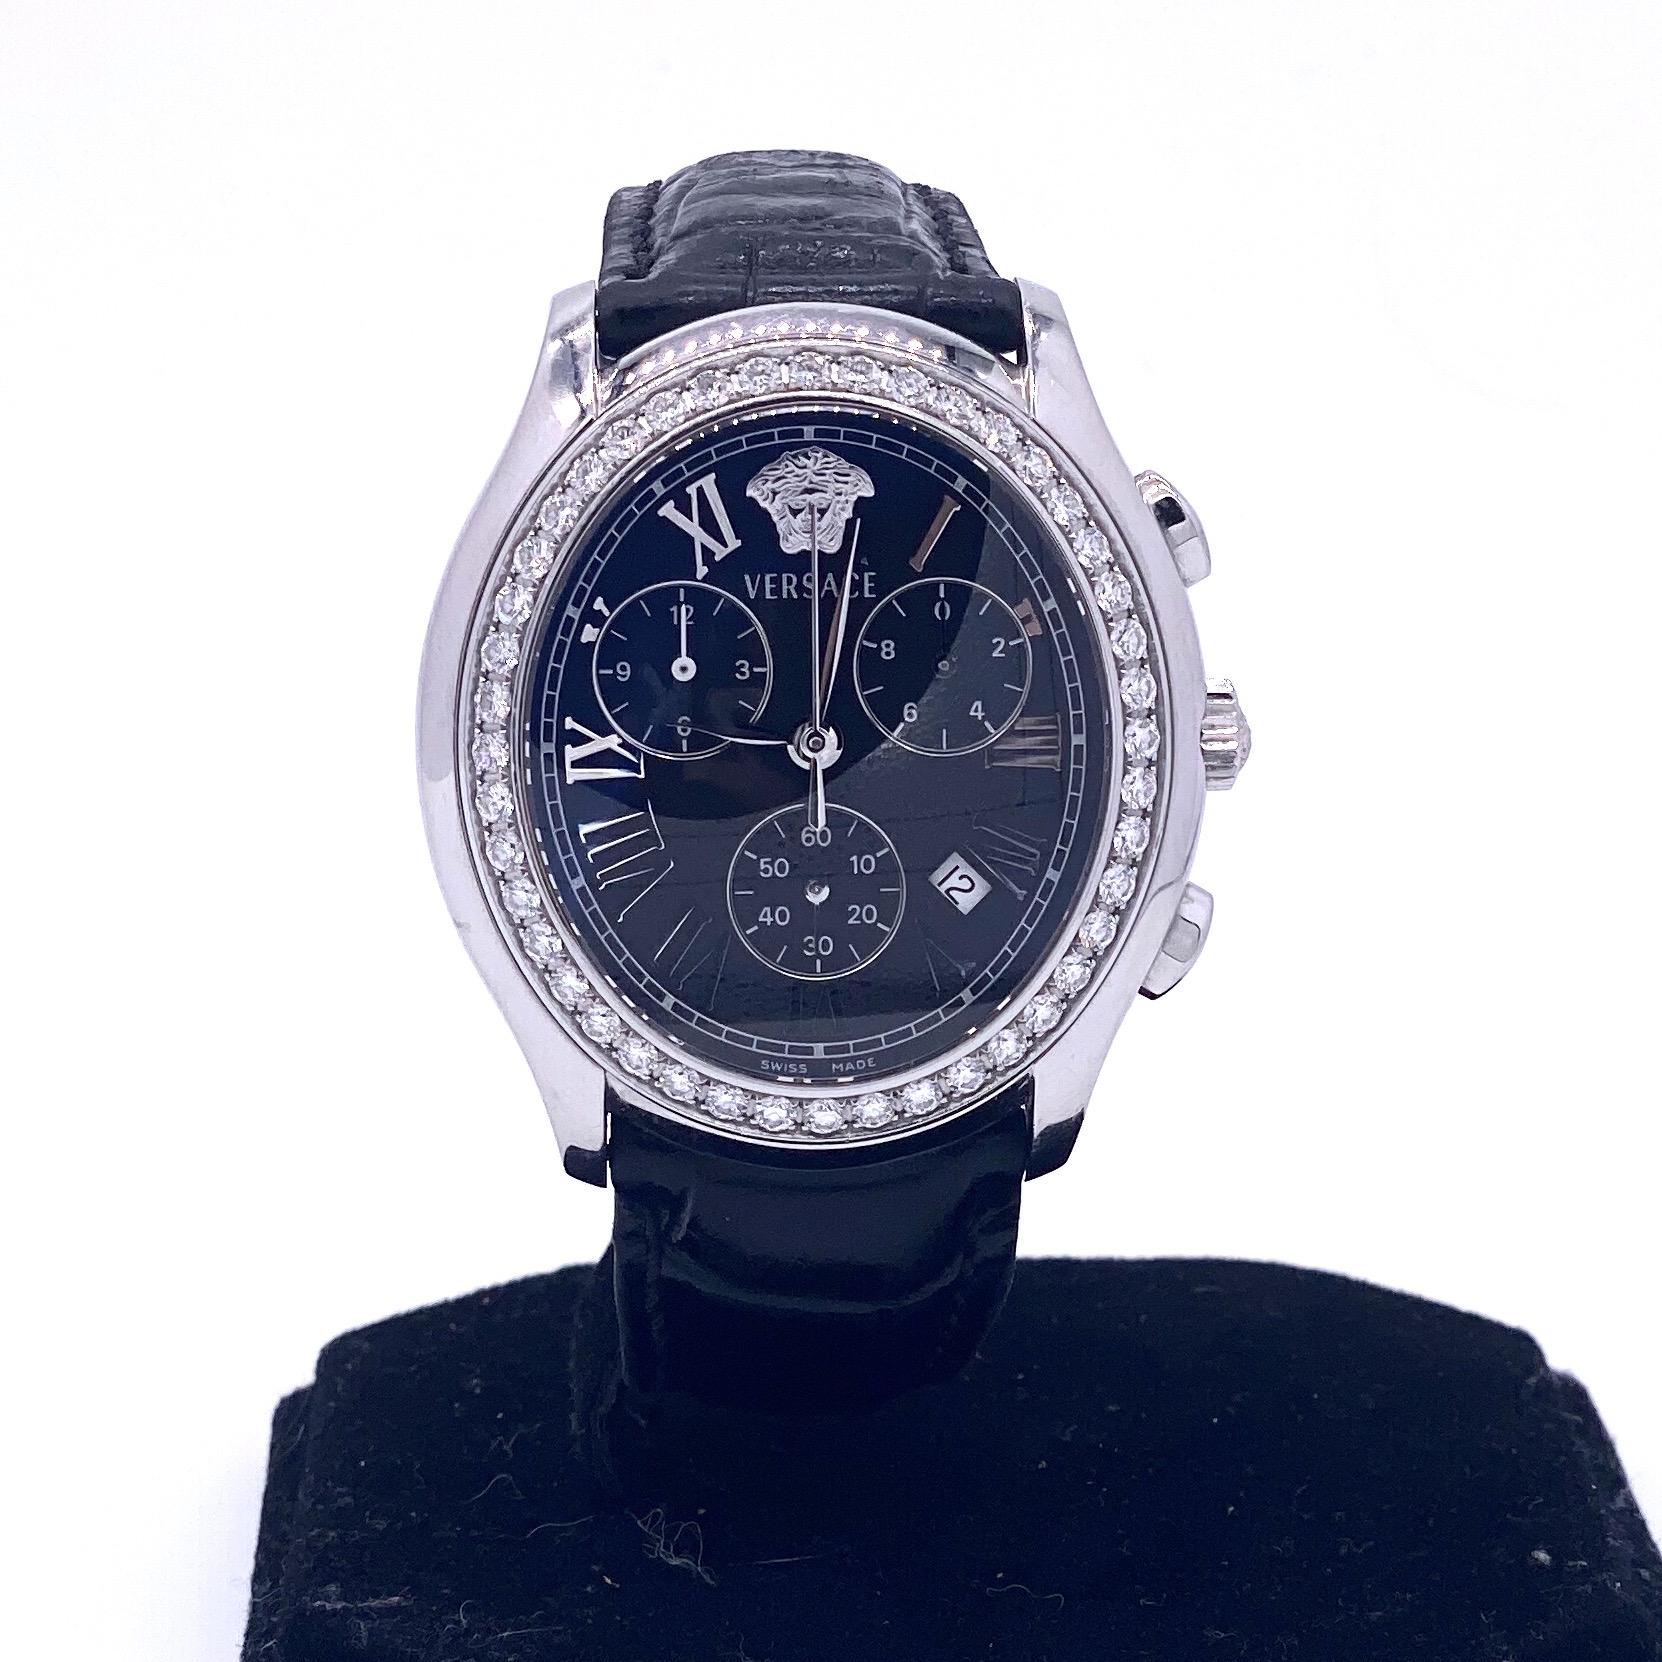 Lot 21 - Versace Chronograph watch with diamond bezel